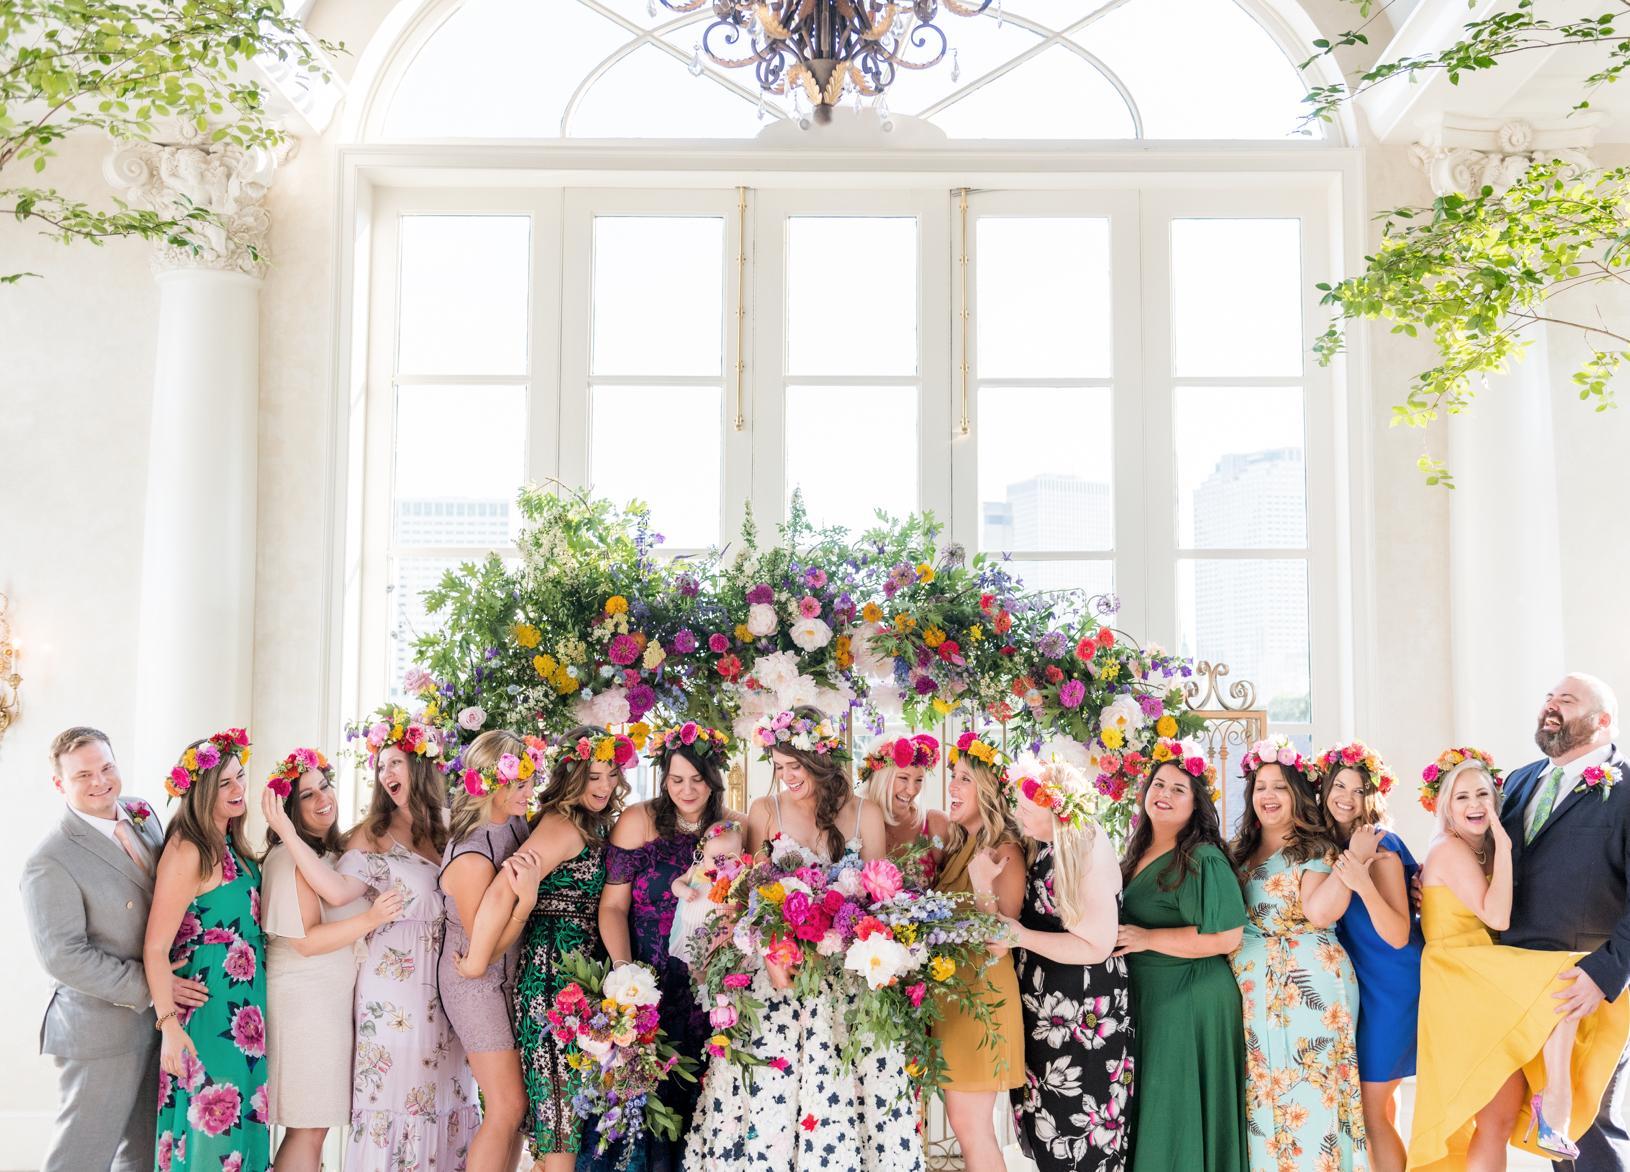 Ceremony - Aislinn Kate Wedding Photography - Pensacola, Florida